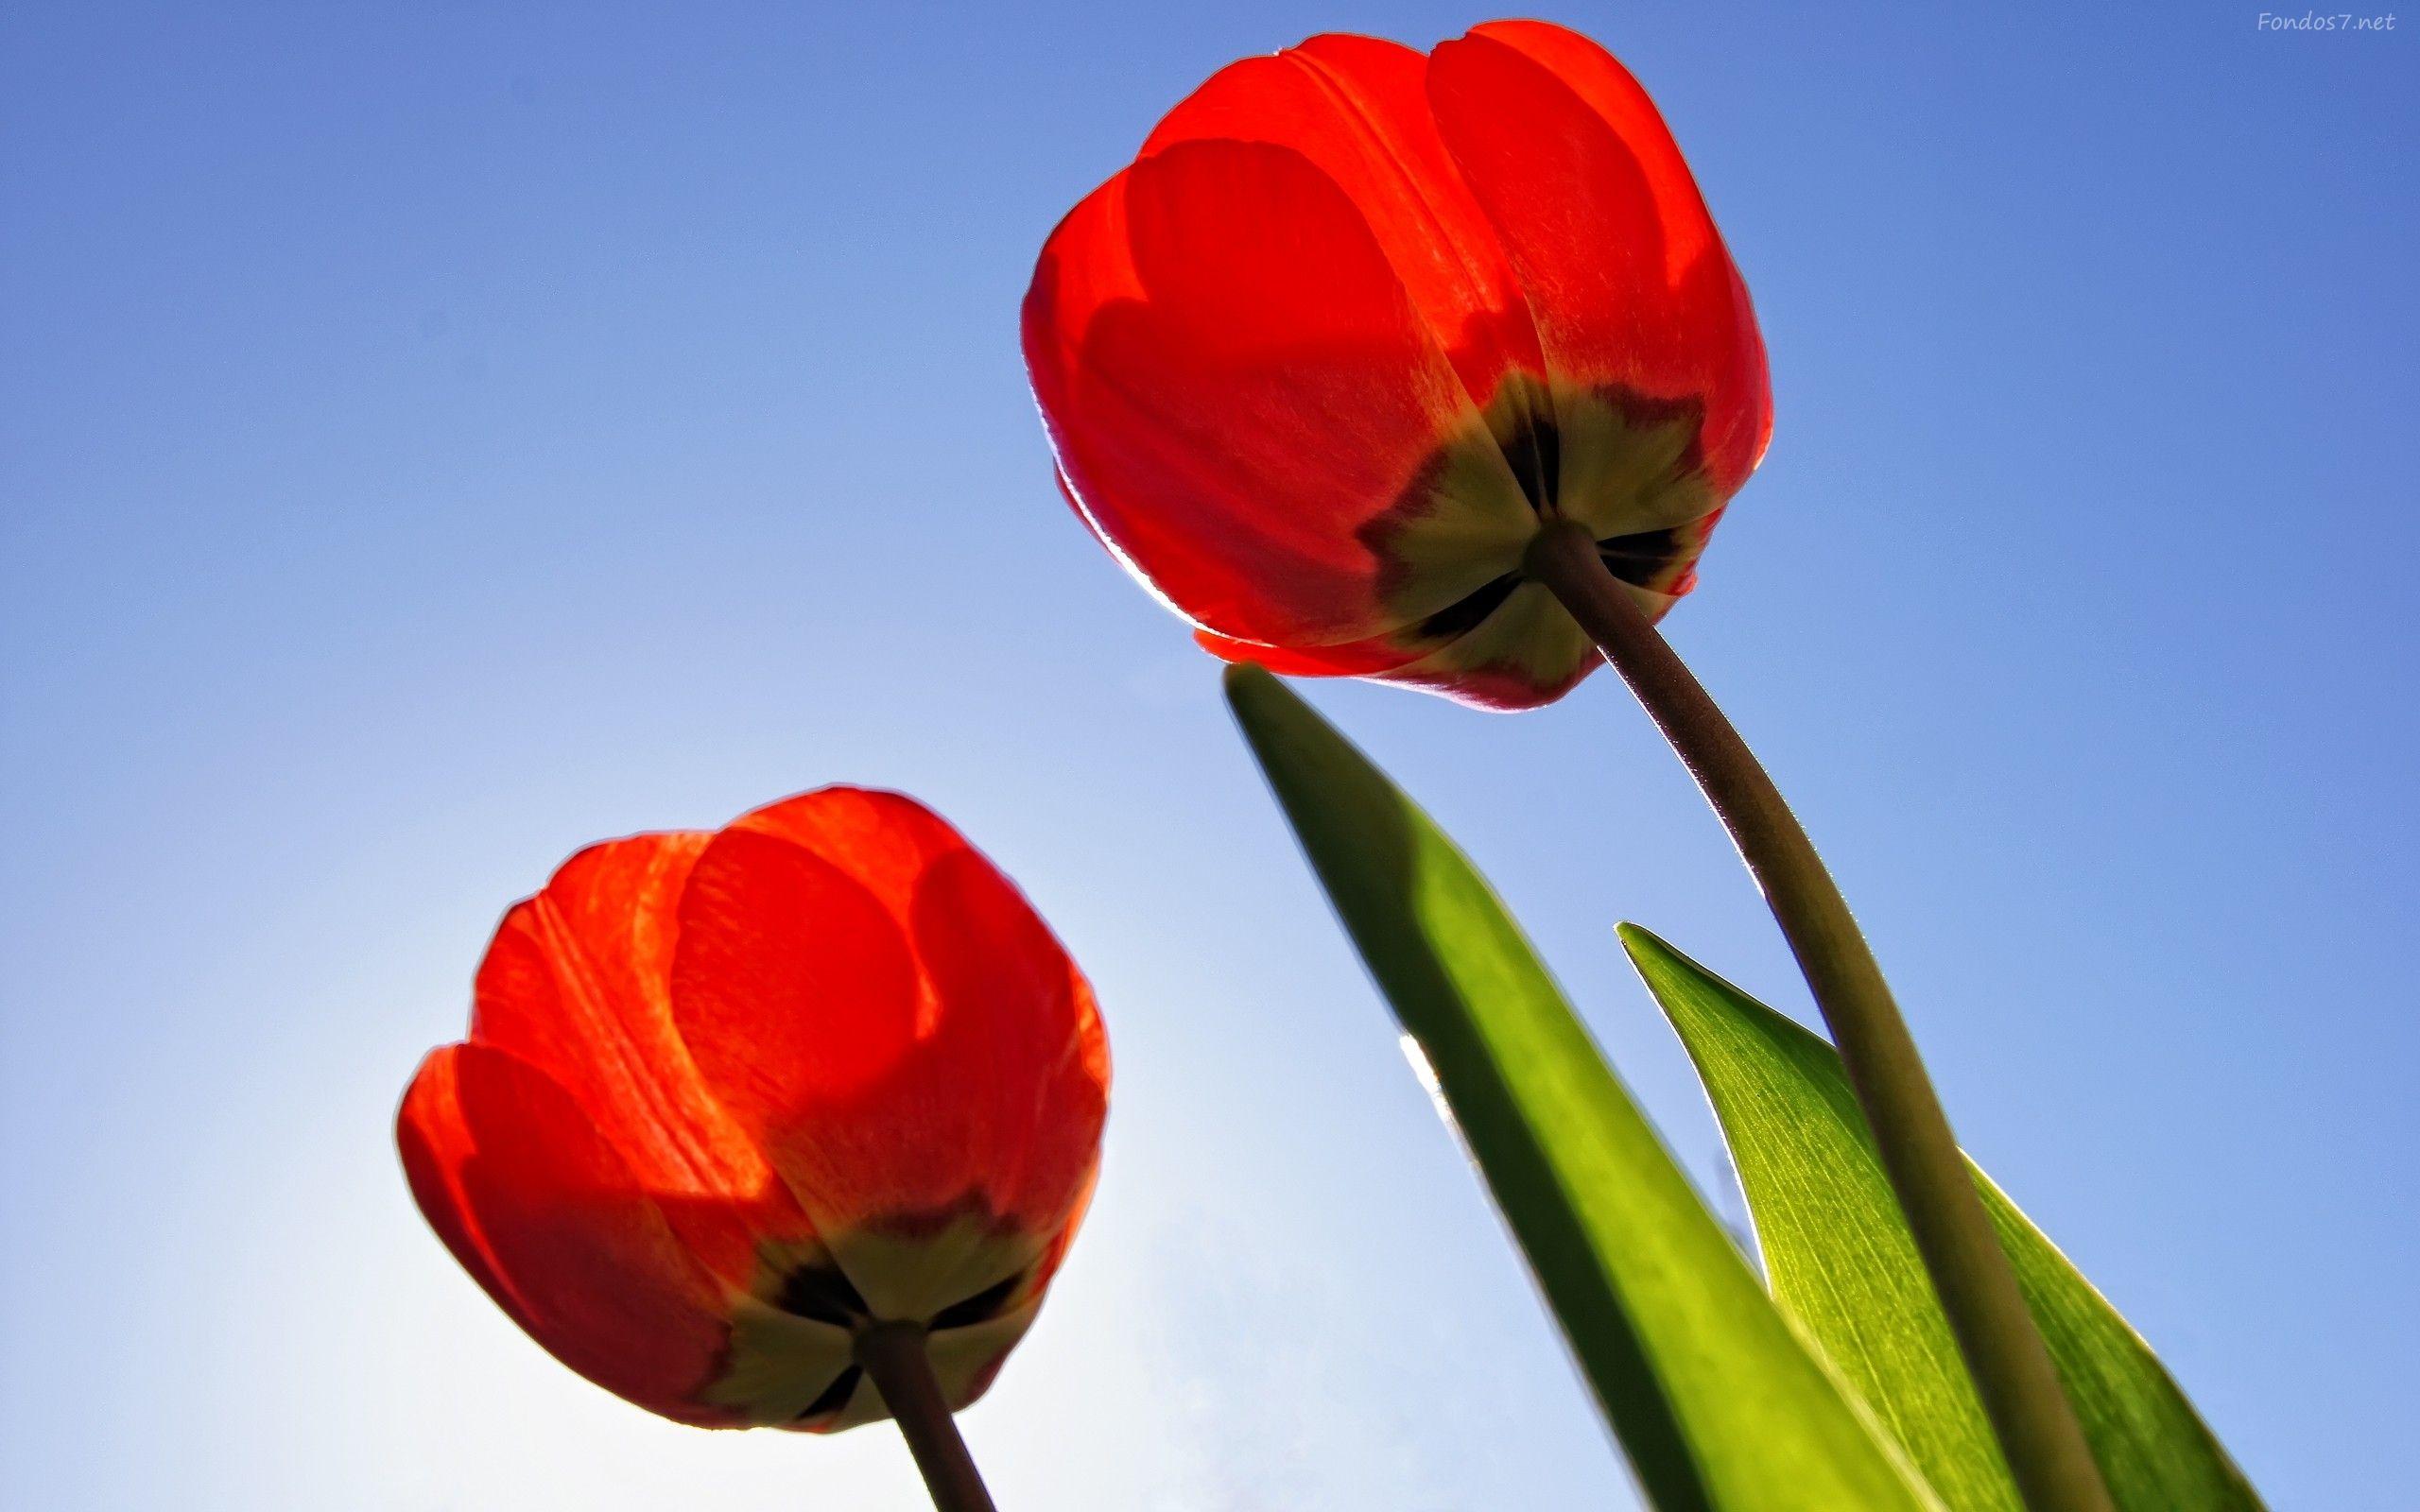 Fondos De Pantalla De Flores Hermosas Para Fondo Celular: Fondos De Pantalla De Flores Hermosas Para Fondo Celular